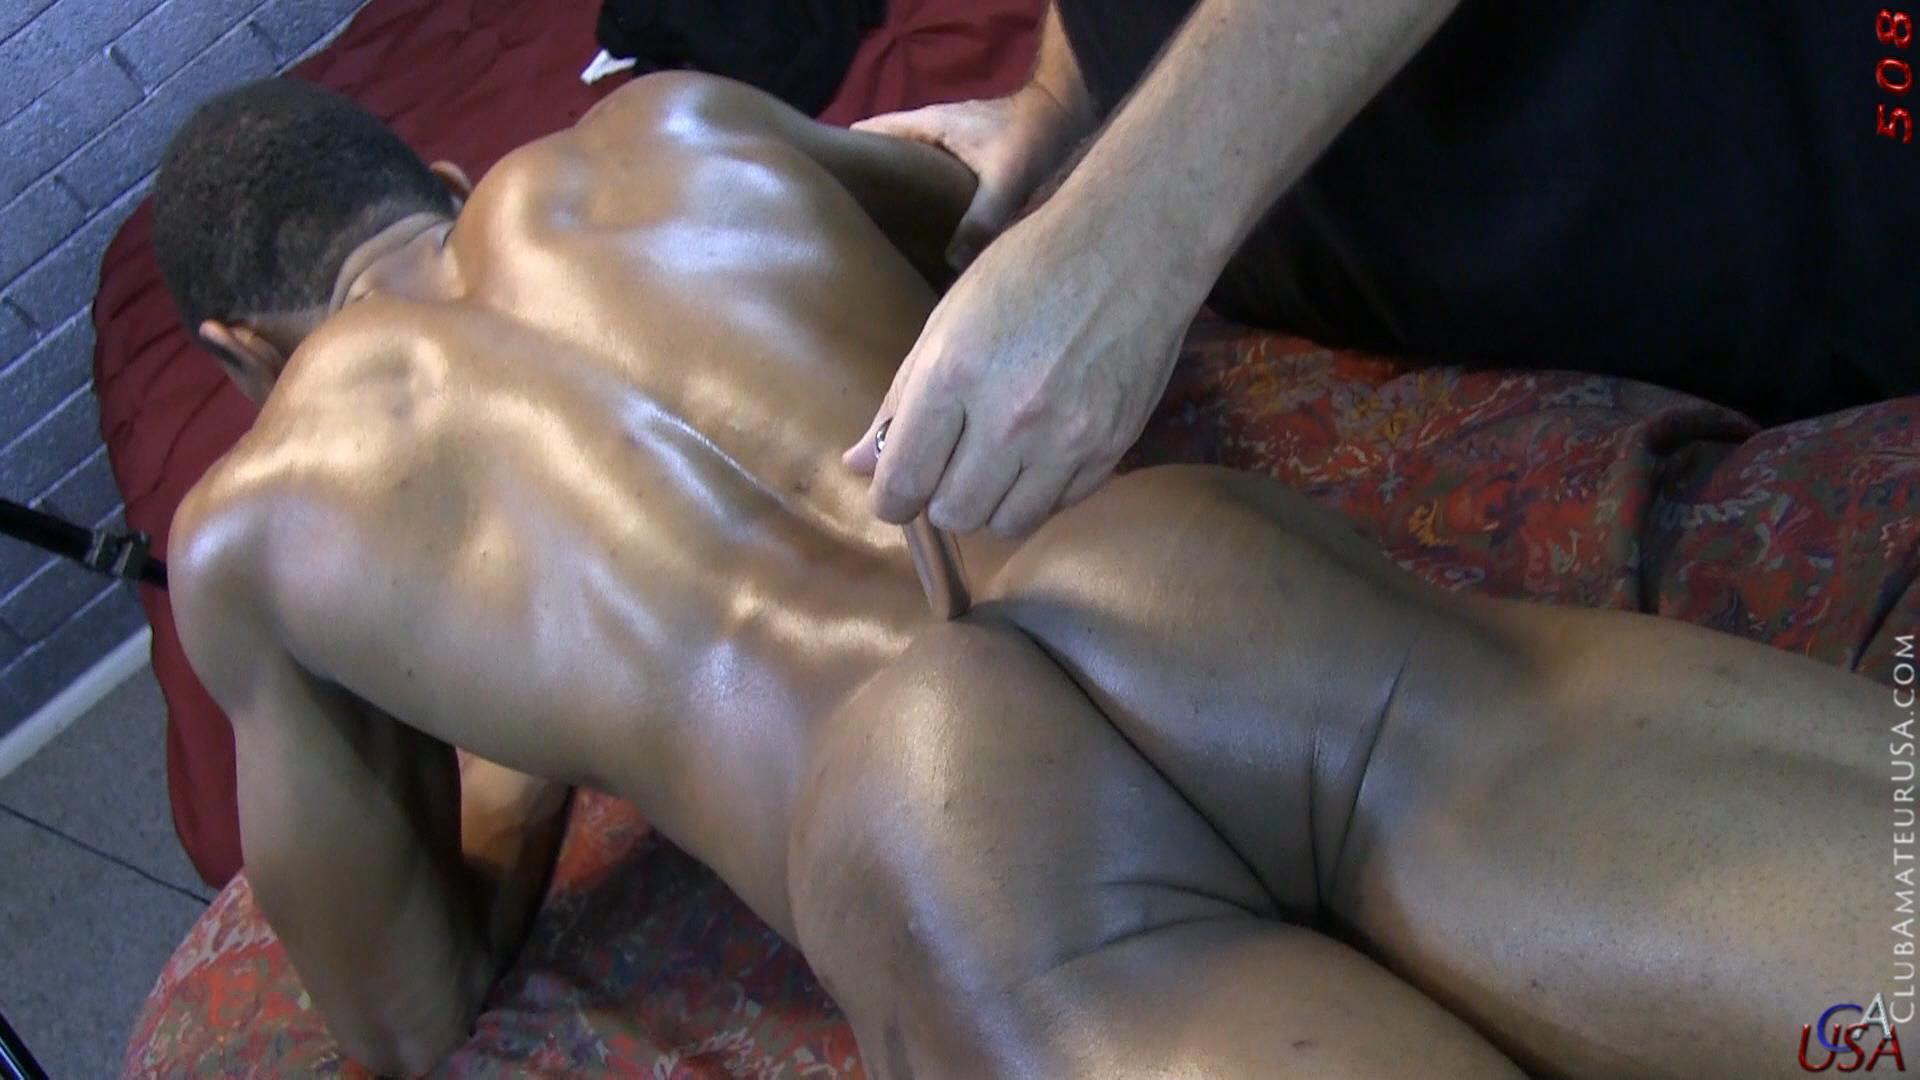 massage whit happy ending in chicago Western Australia